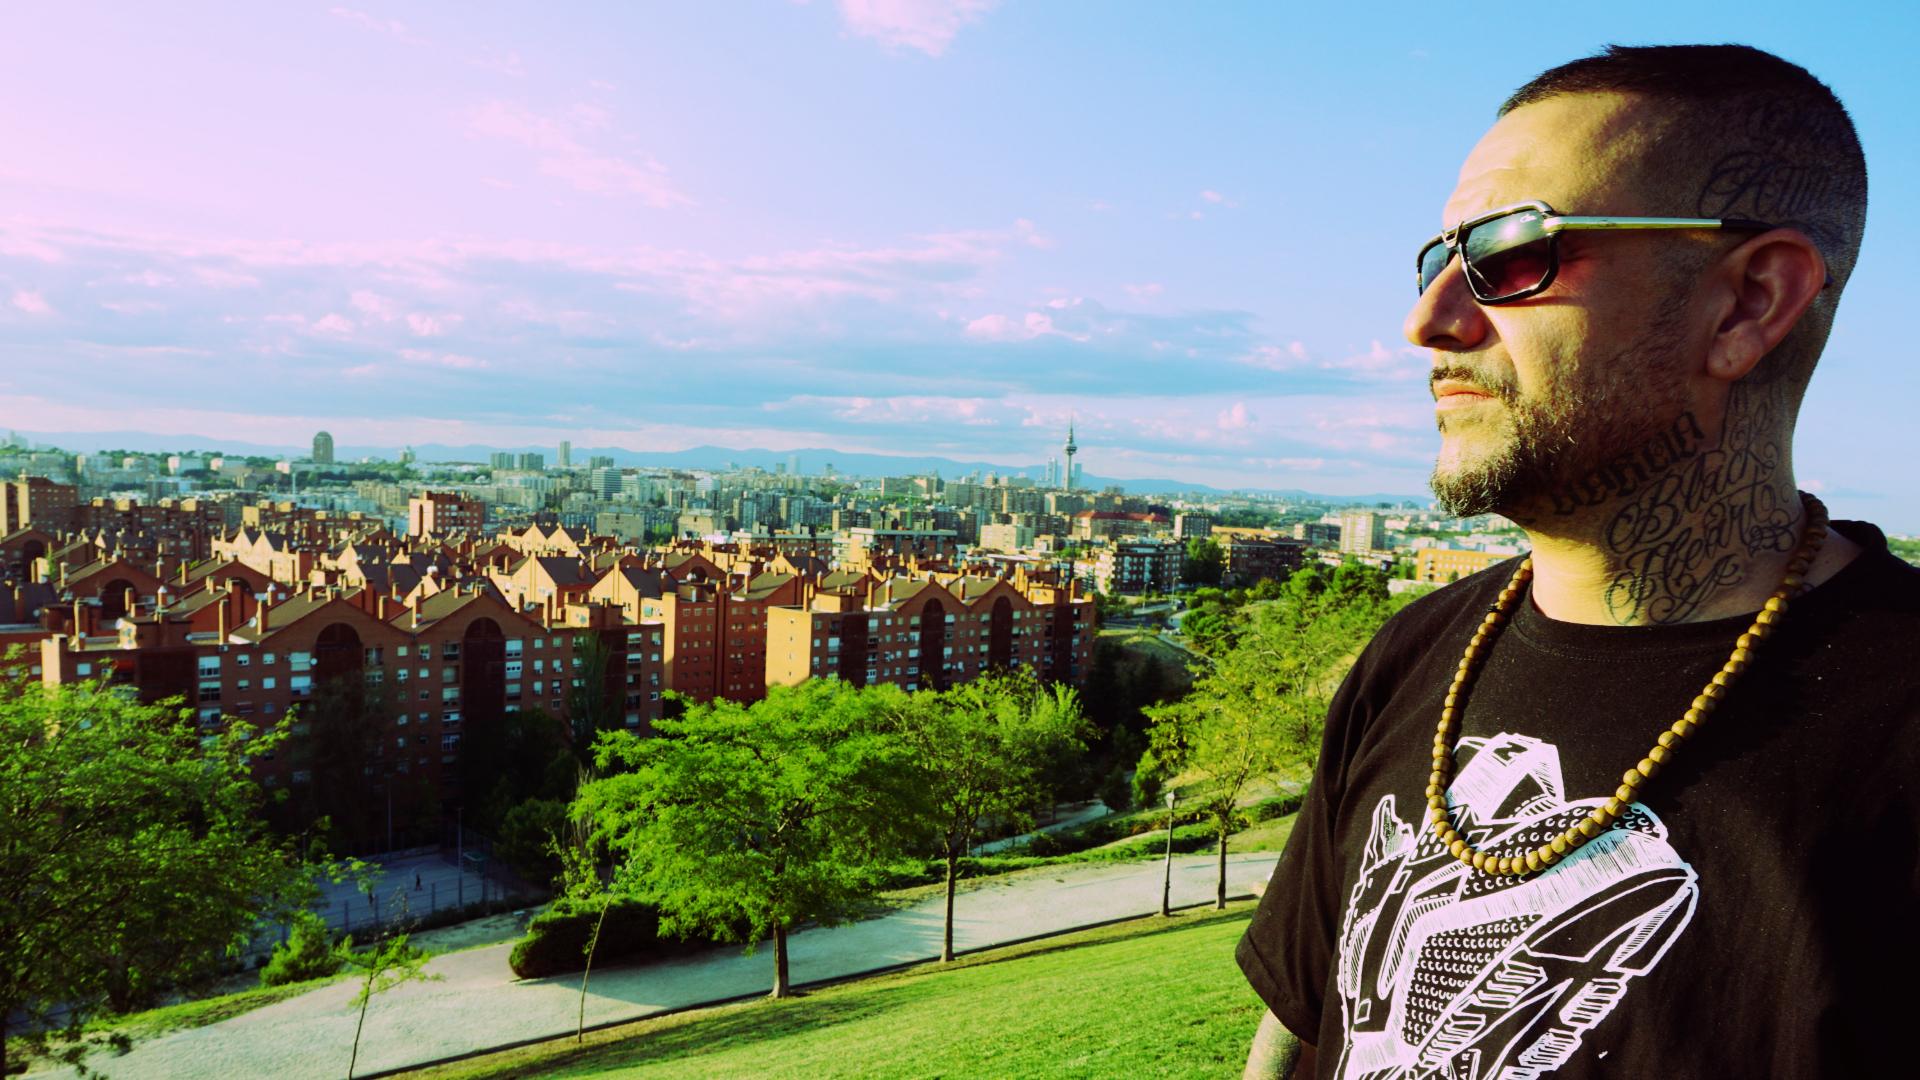 Atrvpadxs - Carmona, 25 años de carrera (I)